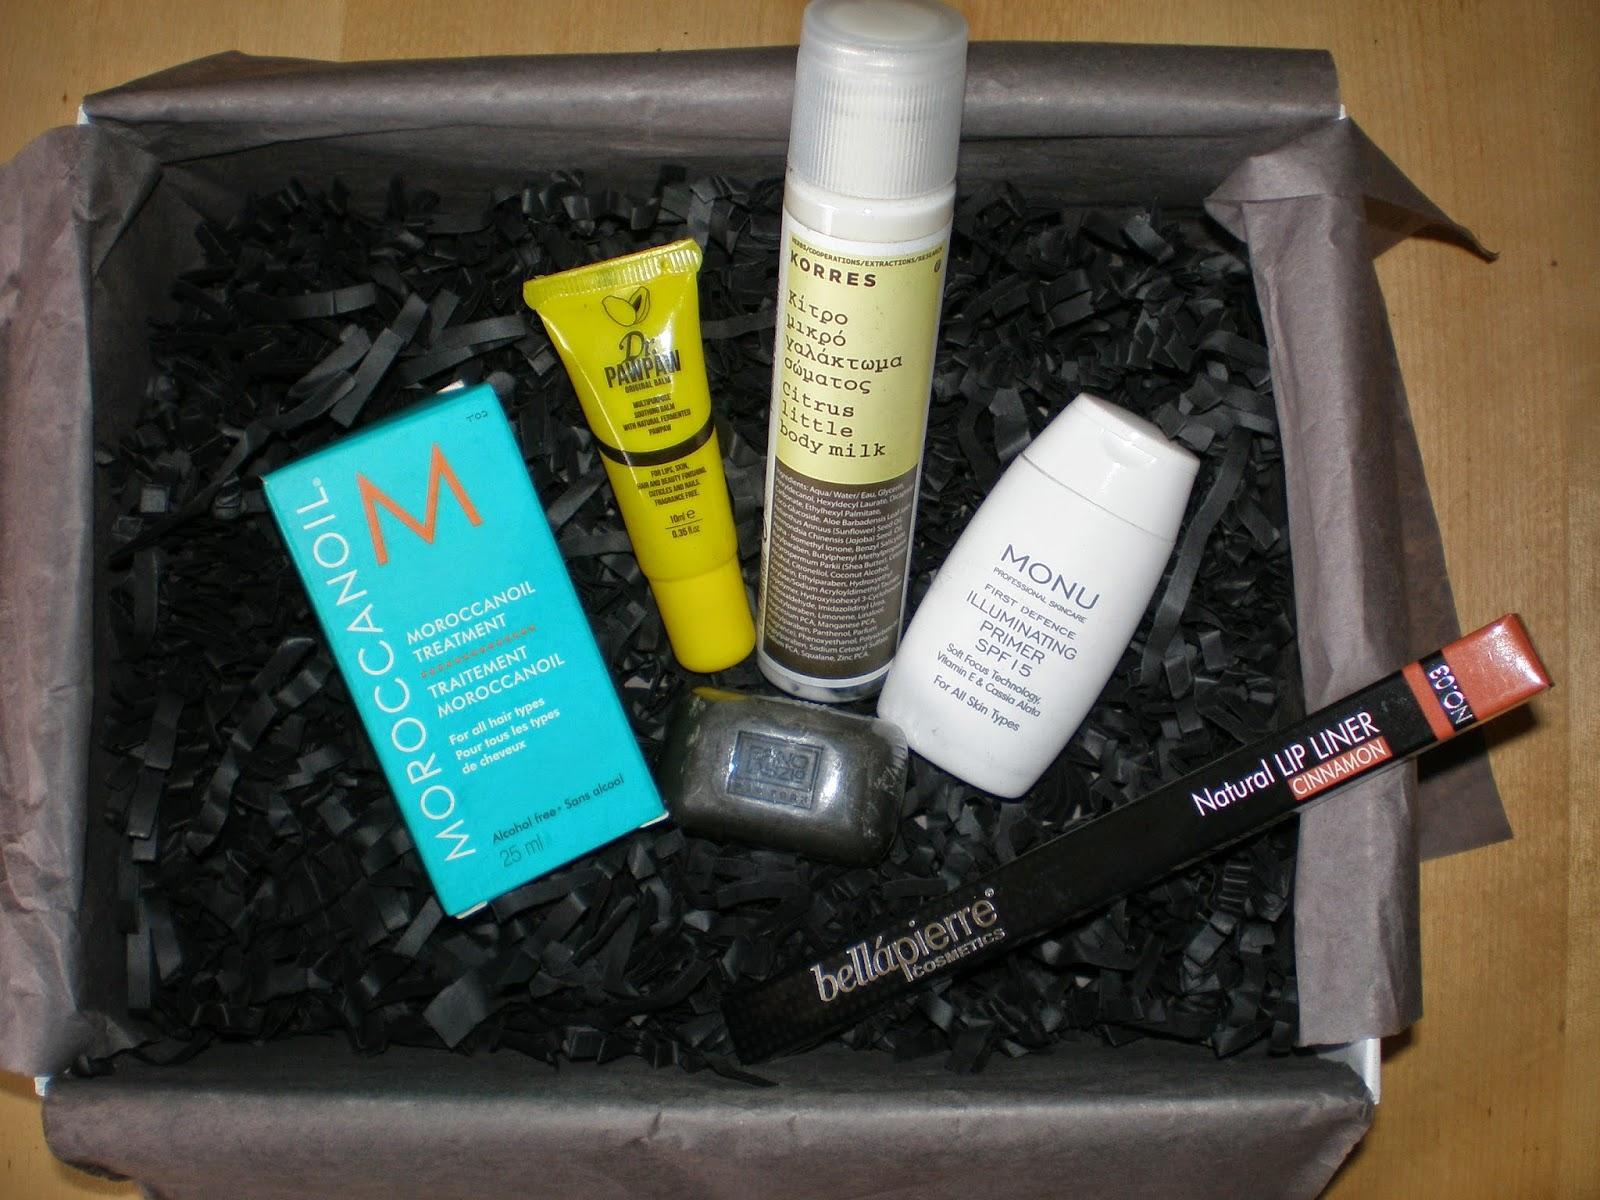 Unboxing February Lookfantastic box